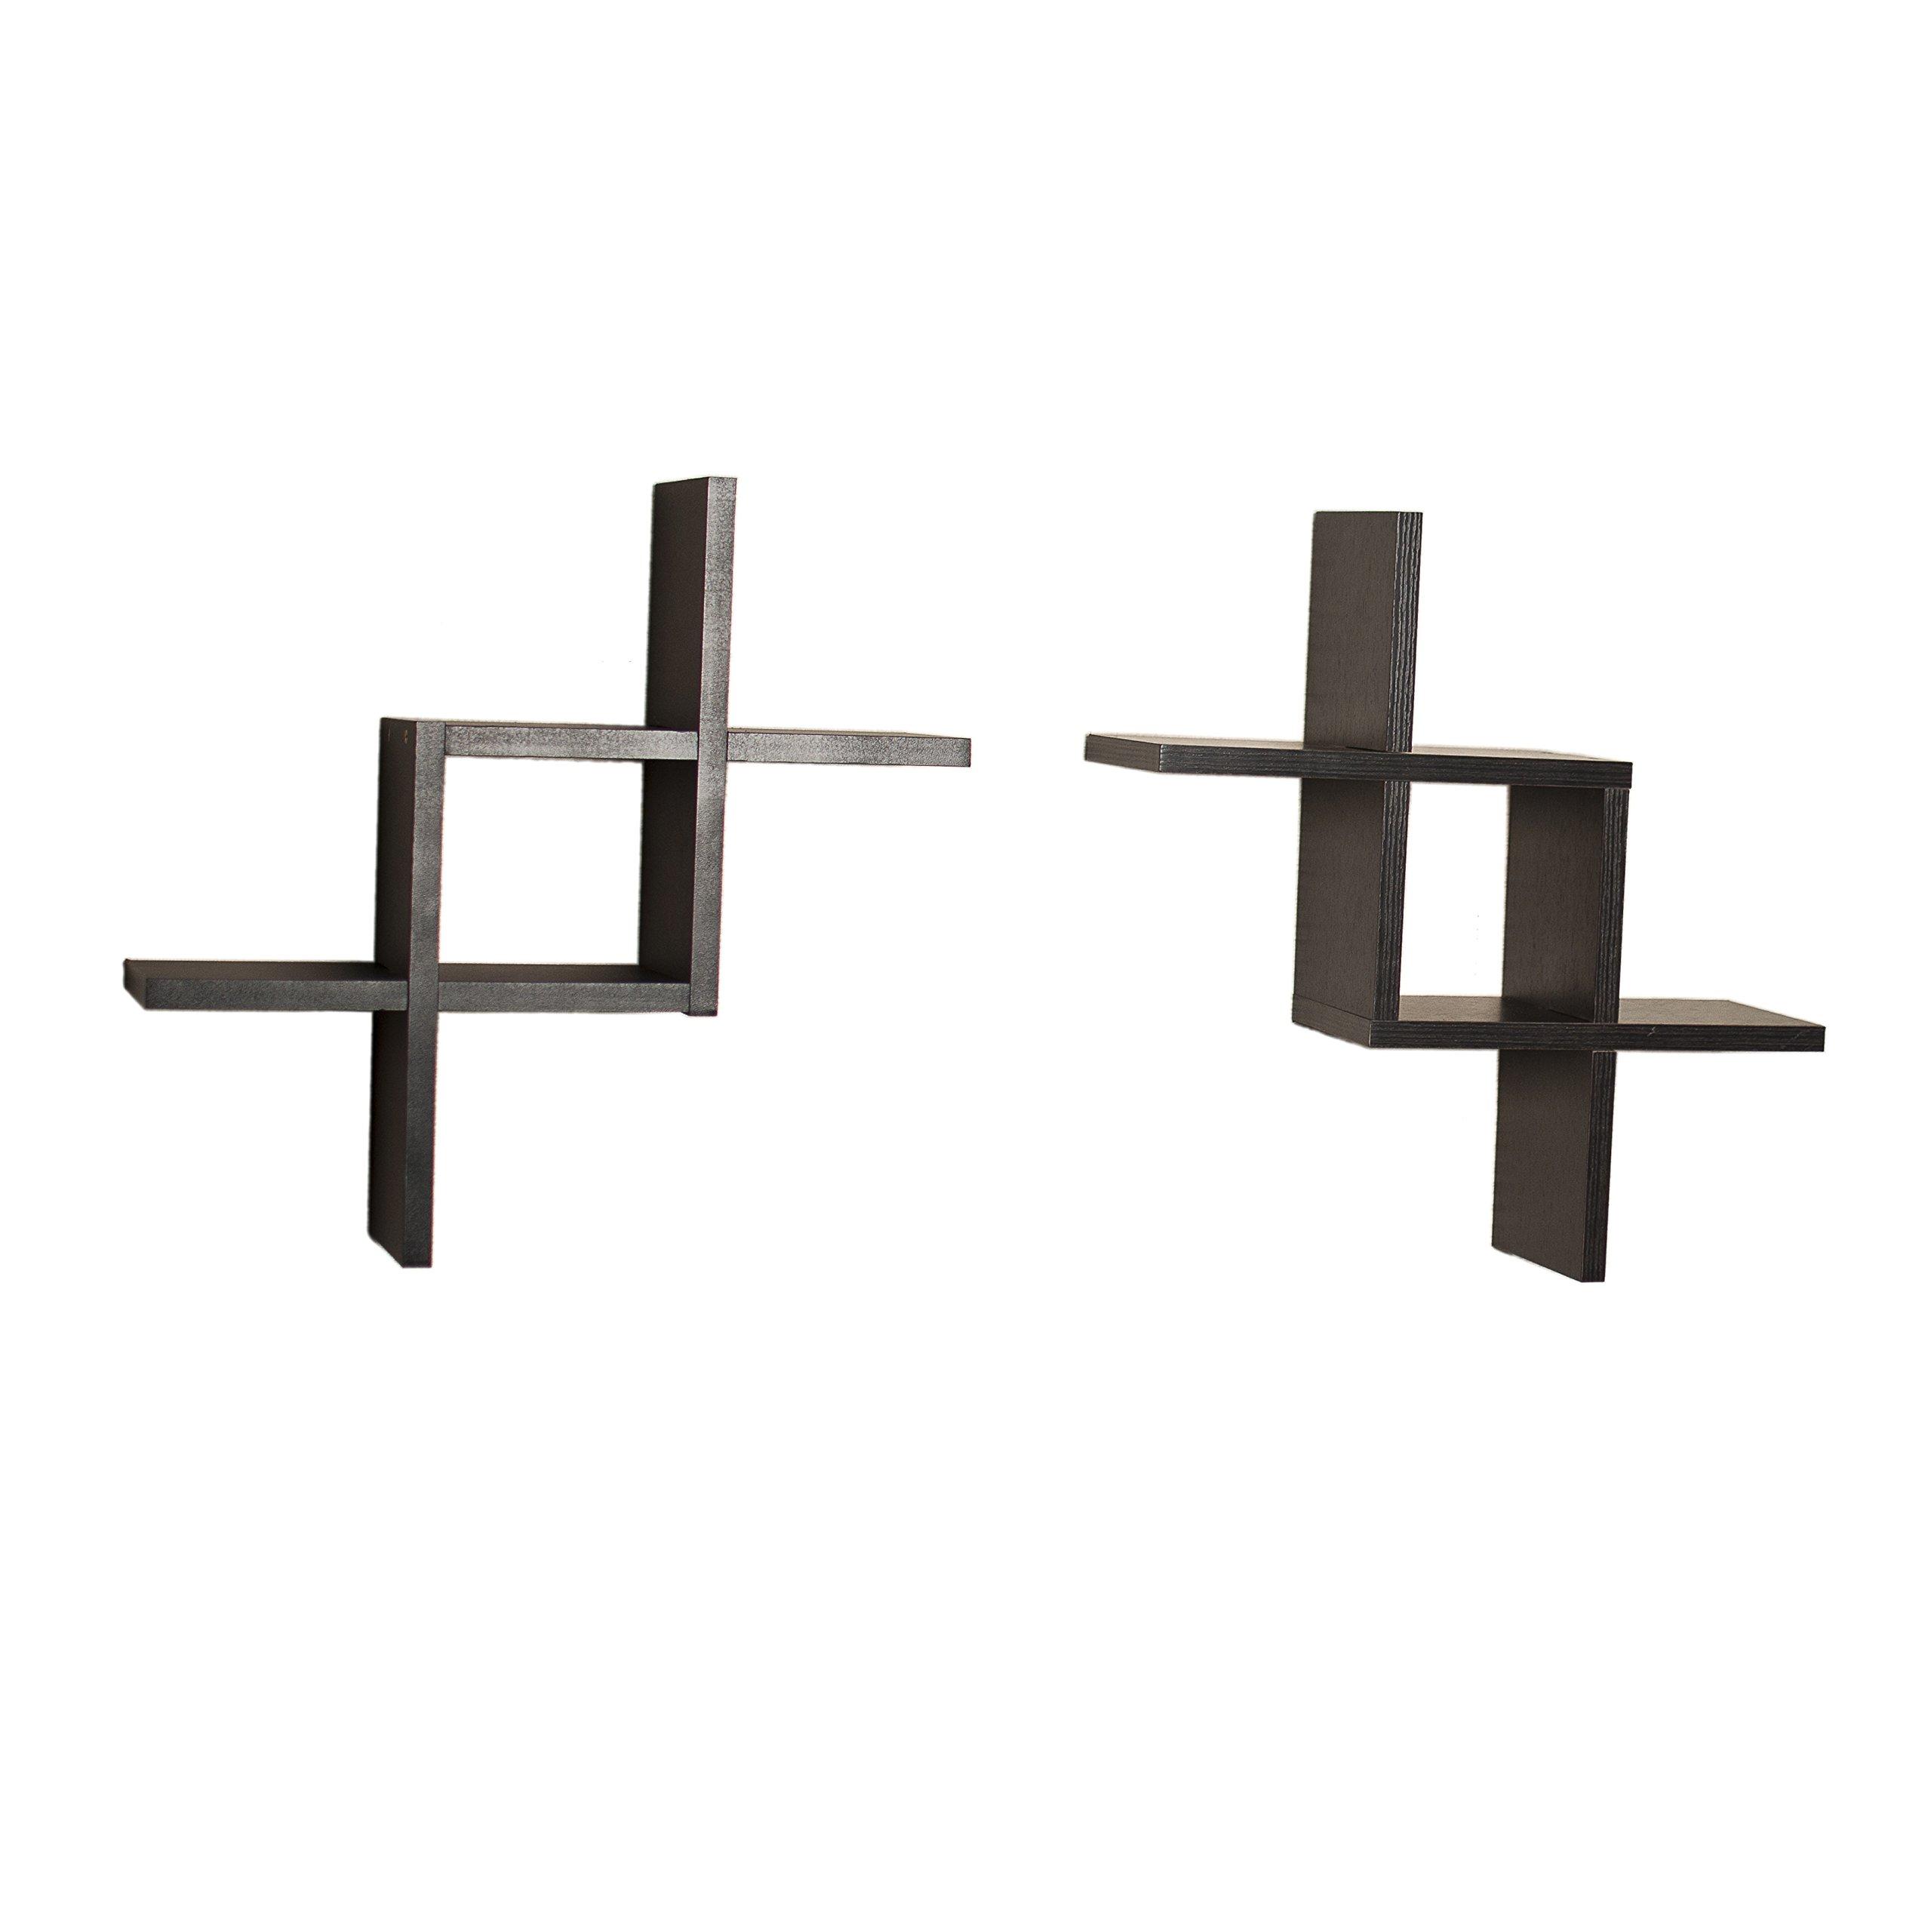 Danya B FF2513B Decorative Wall-Mounted Floating Reversed Criss-Cross Shelves (Set of 2) - Black